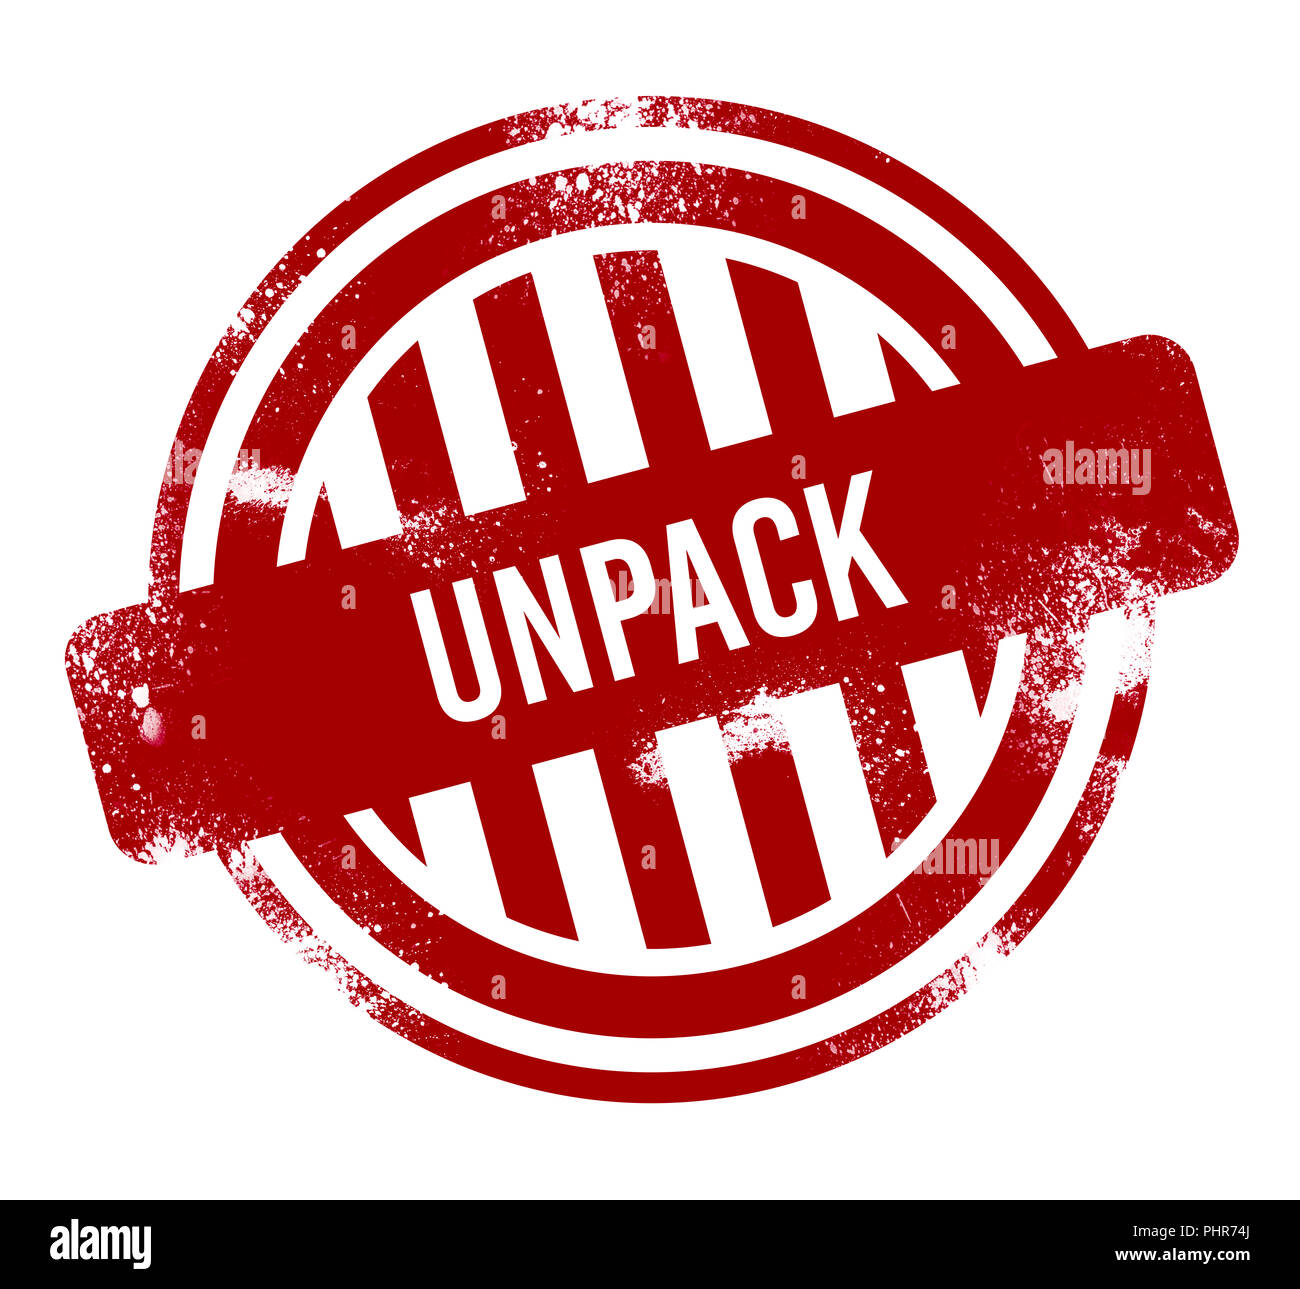 Unpack - grunge stamp, bouton rouge Photo Stock